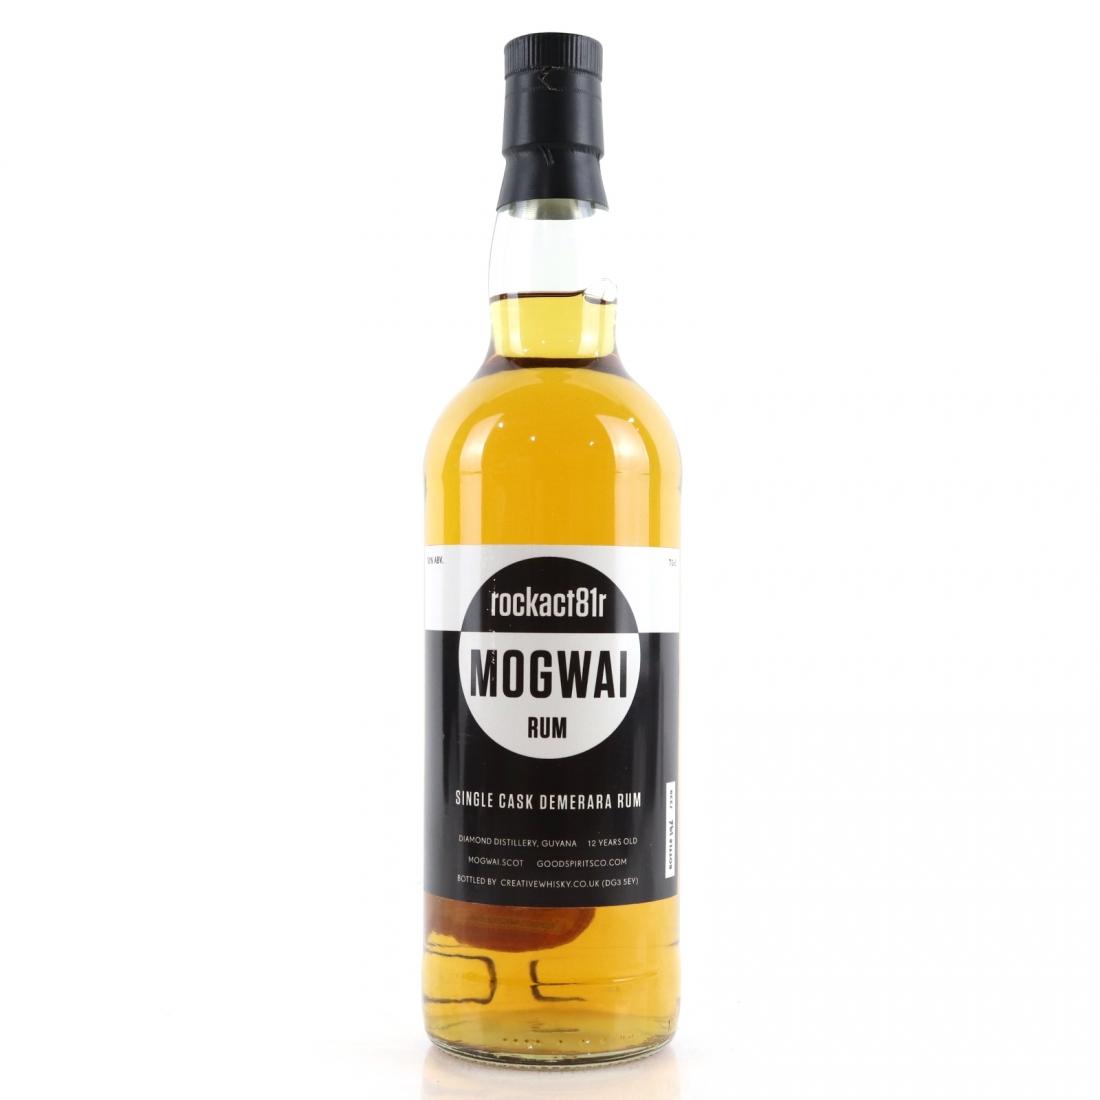 Diamond Distillery 12 Year Old Demarara Rum / Mogwai Rockact81r